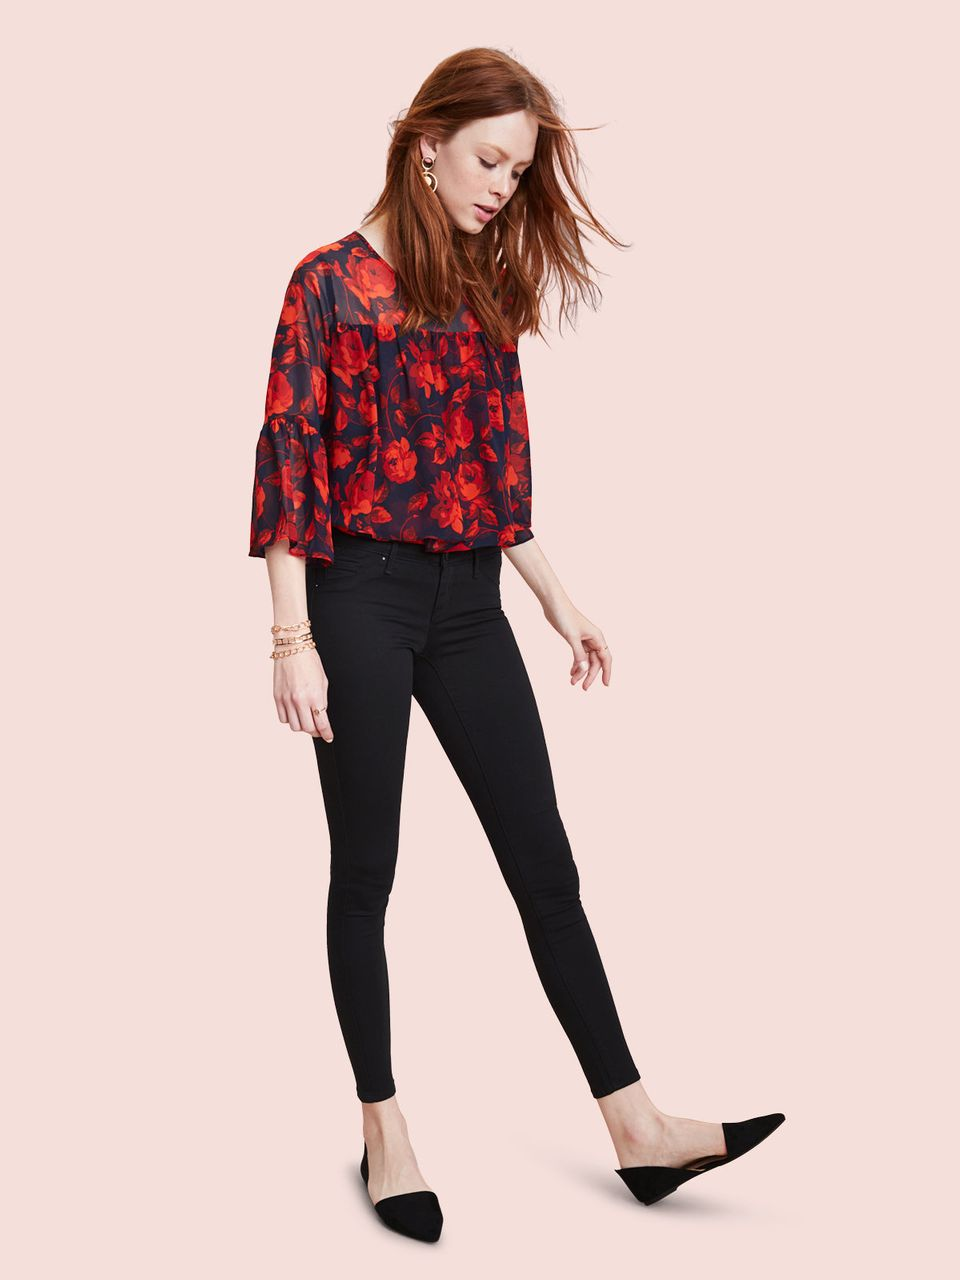 47b15f23 Womens Button Down Shirts Target - DREAMWORKS